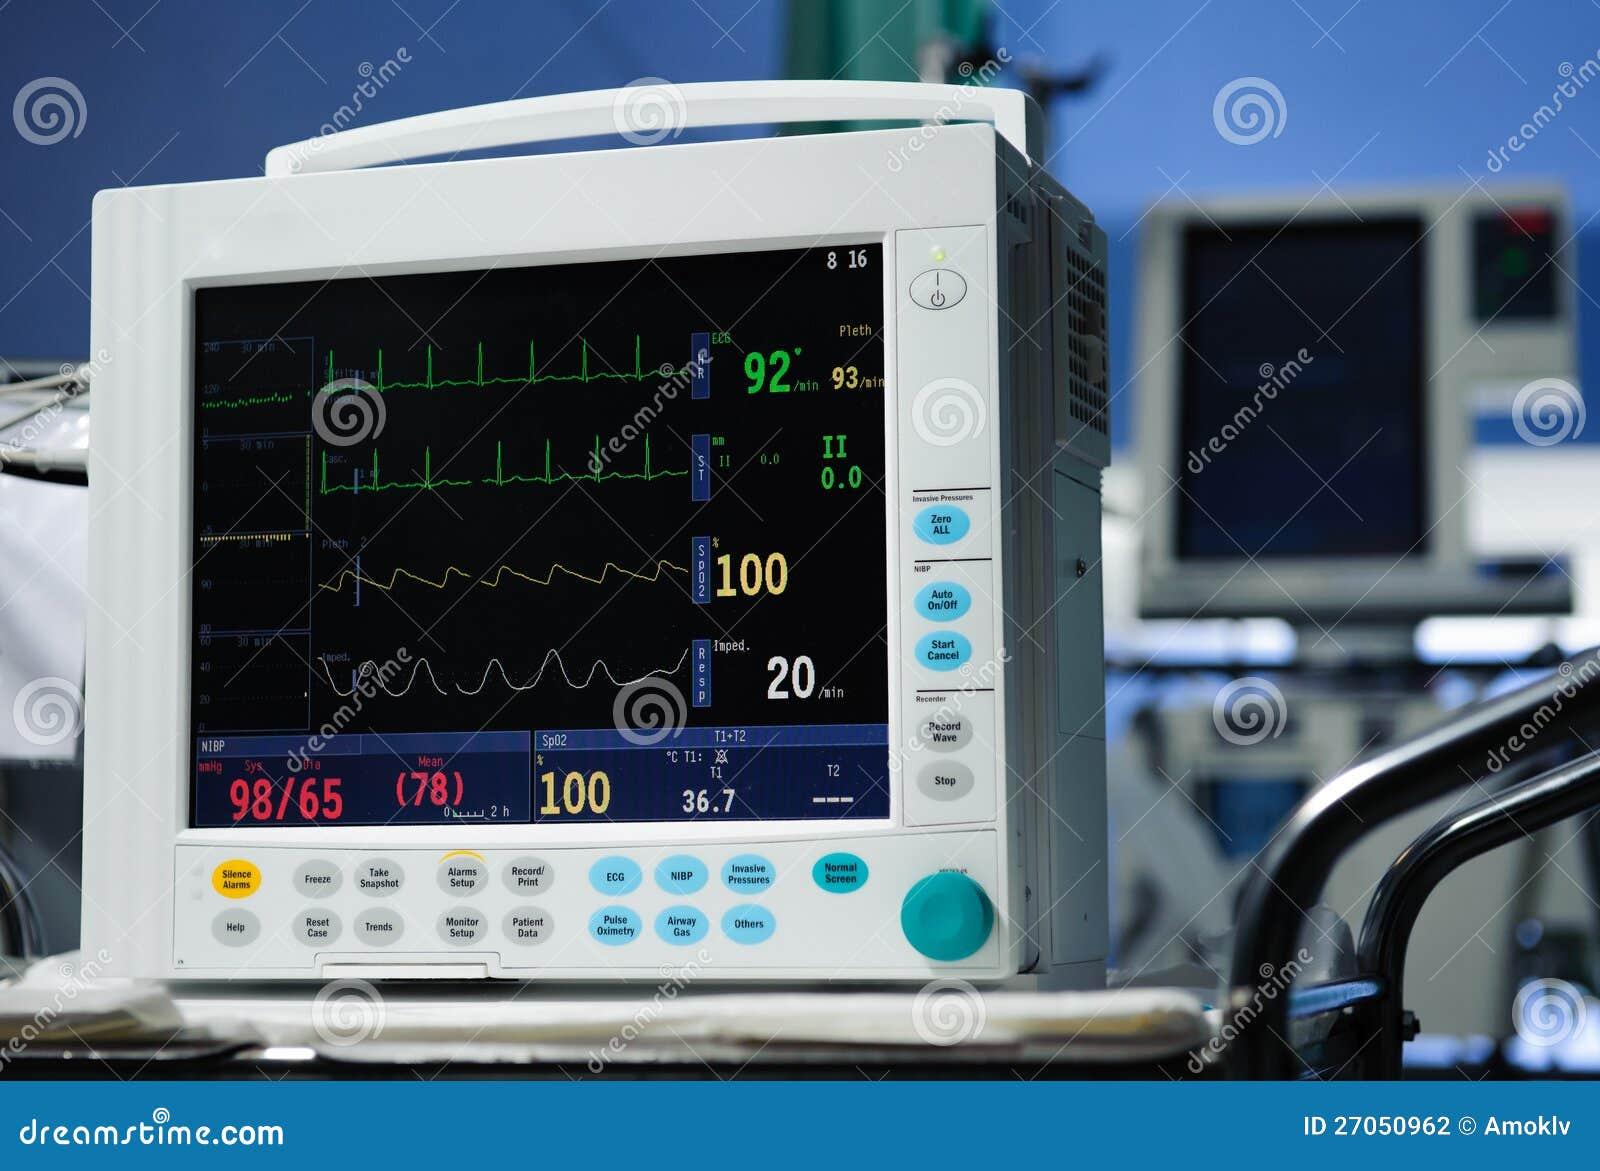 Anesthesia Monitor Description Stock Photo - Image of